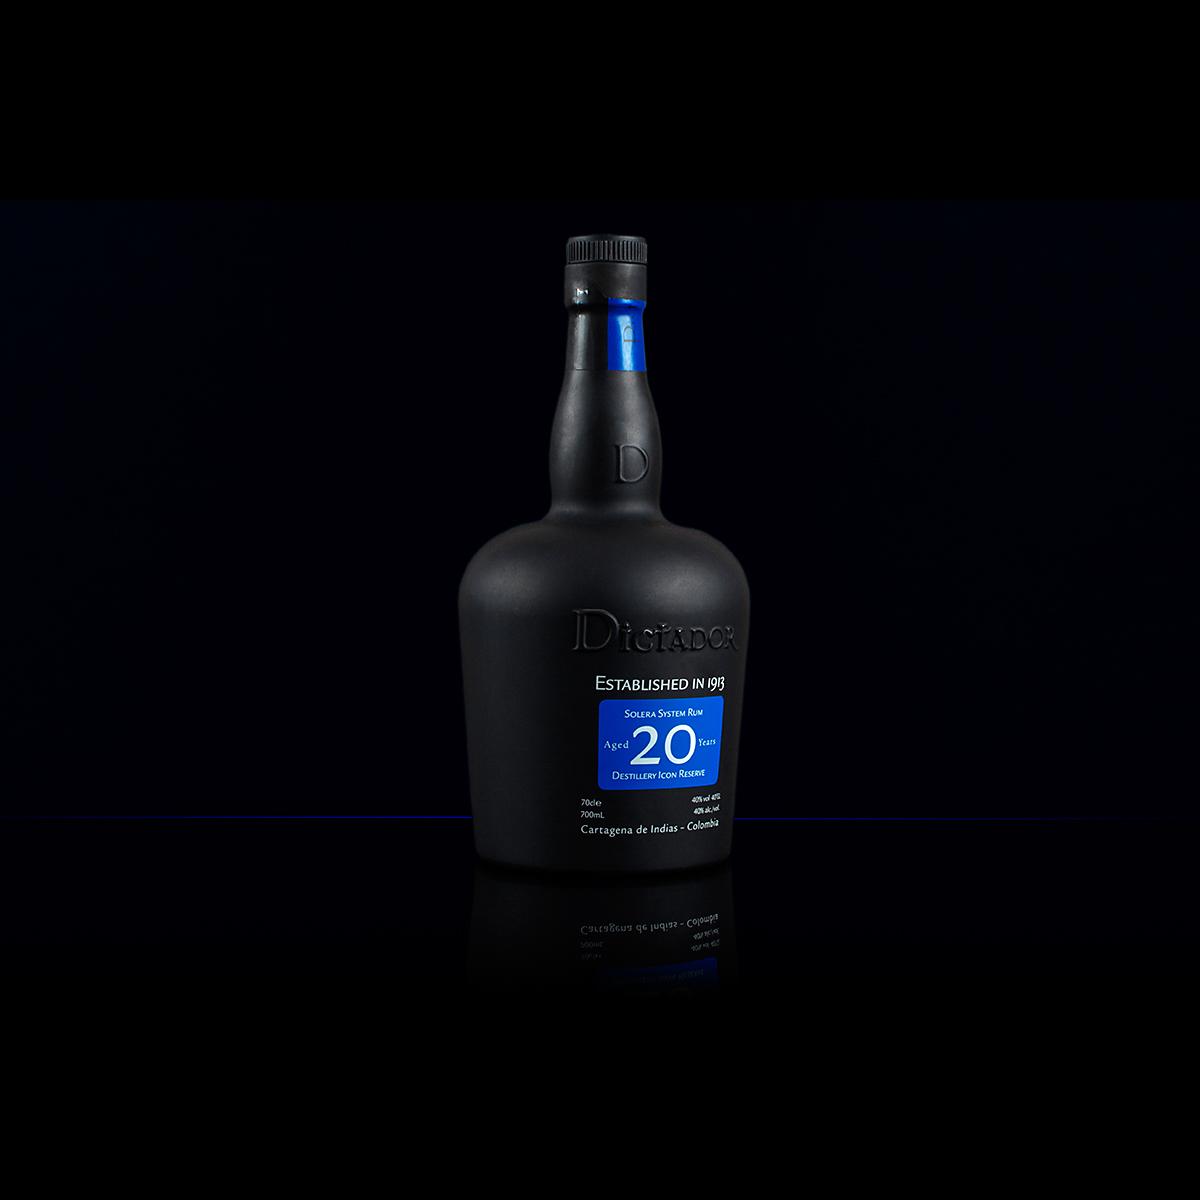 Łukasz Liszko - fotografia produktowa - packshots - Rum Dictador 20y